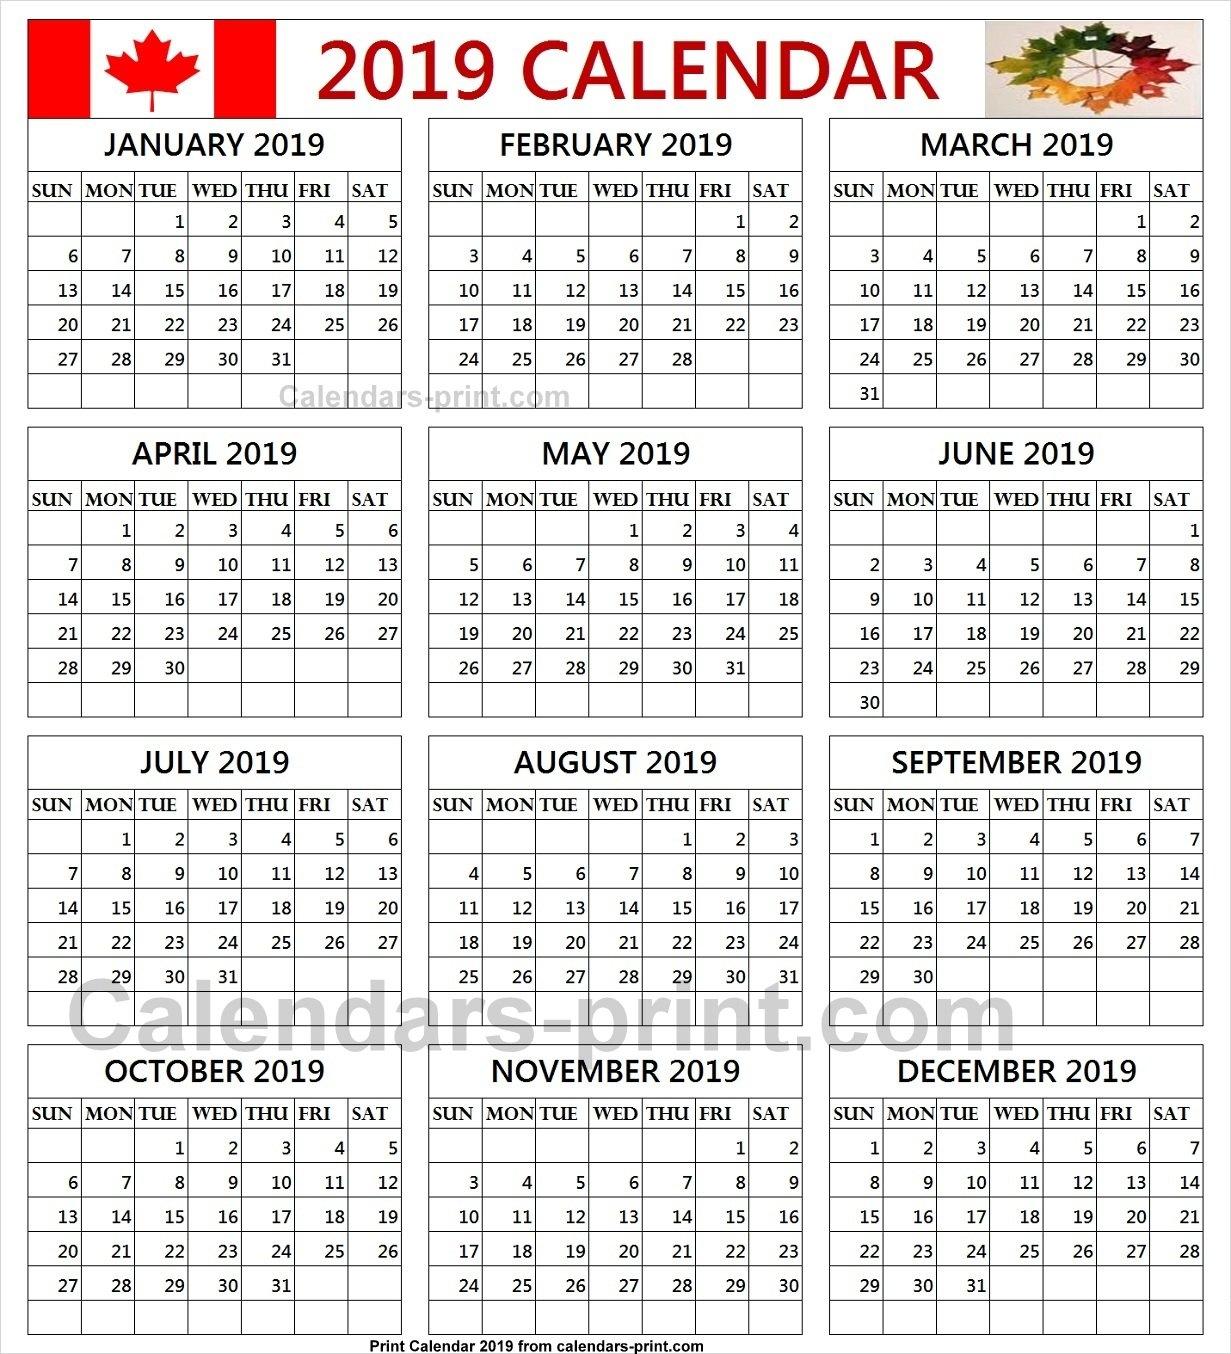 Free Calendar 2019 Canada Printable Template With Notes   Holidays Calendar Of 2019 Canada